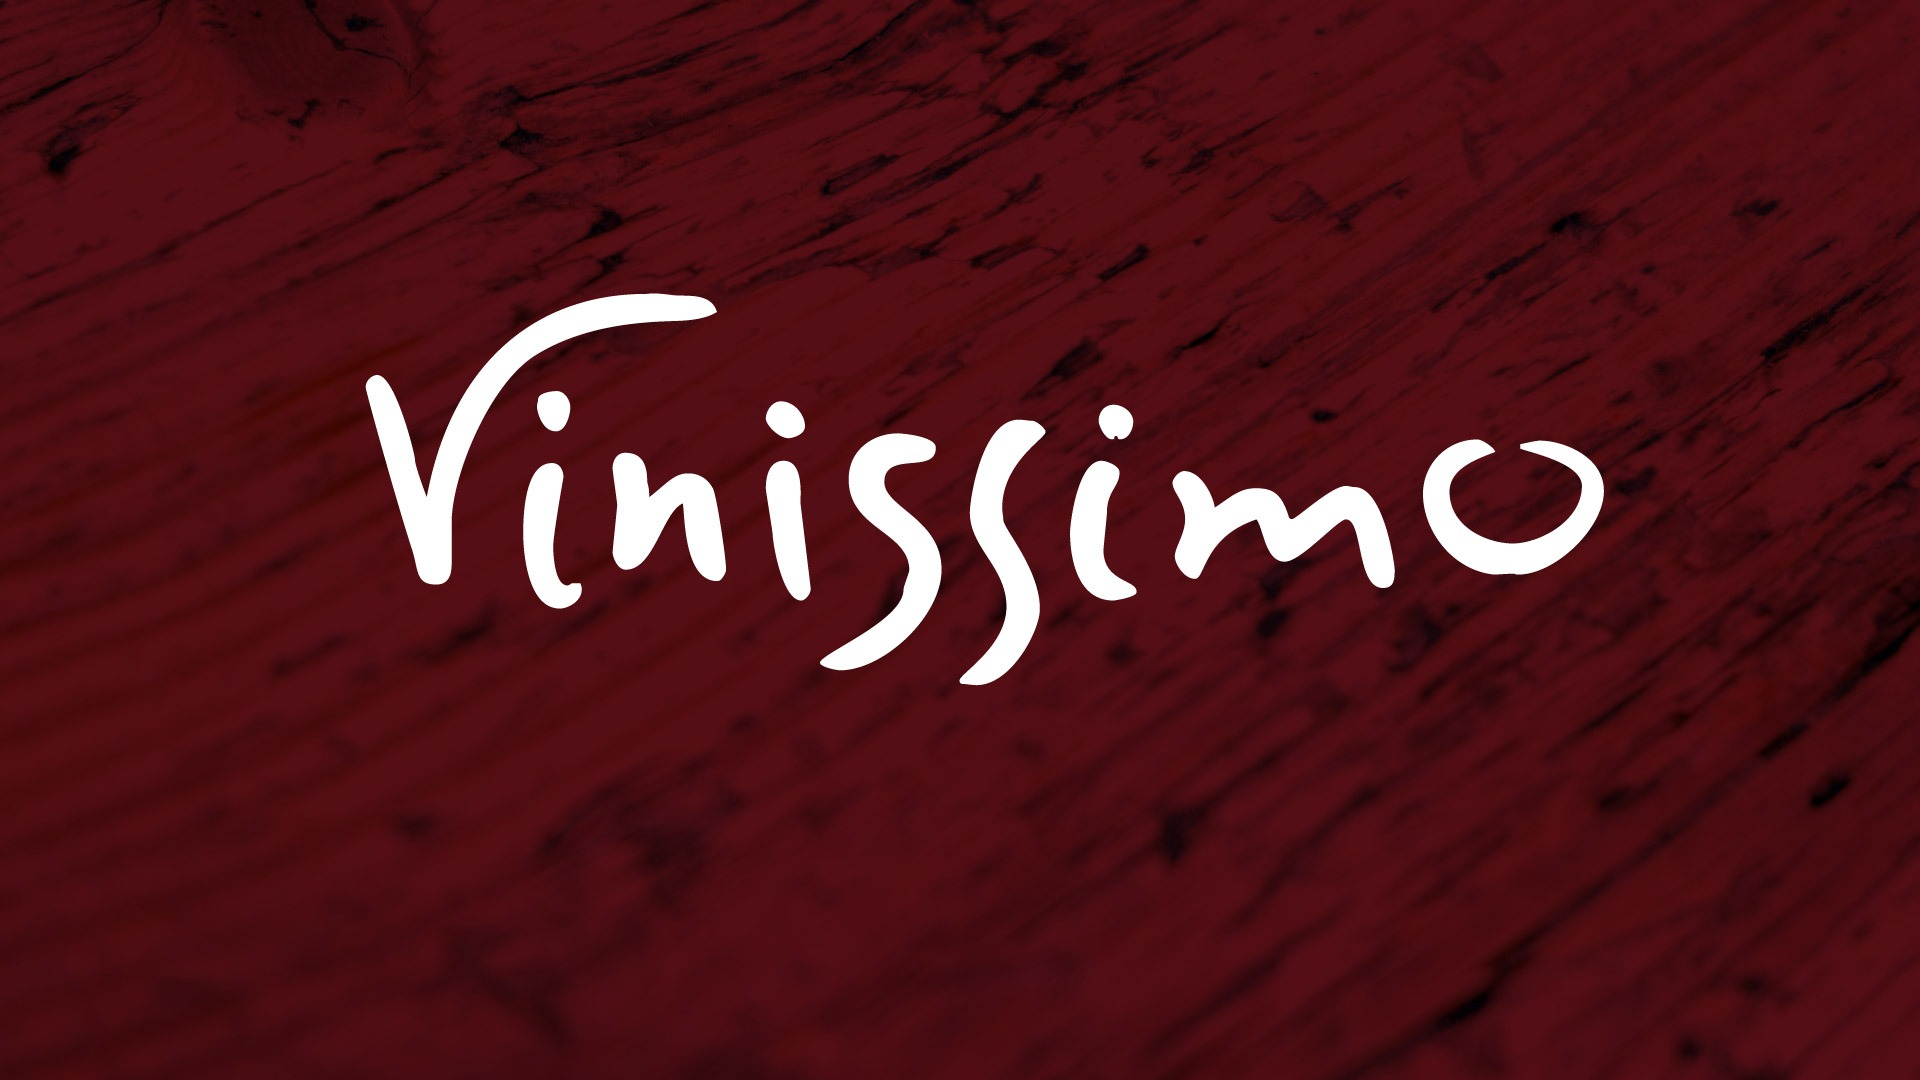 Asgard Branding, corporate identity, branding, wine, logo design, package design